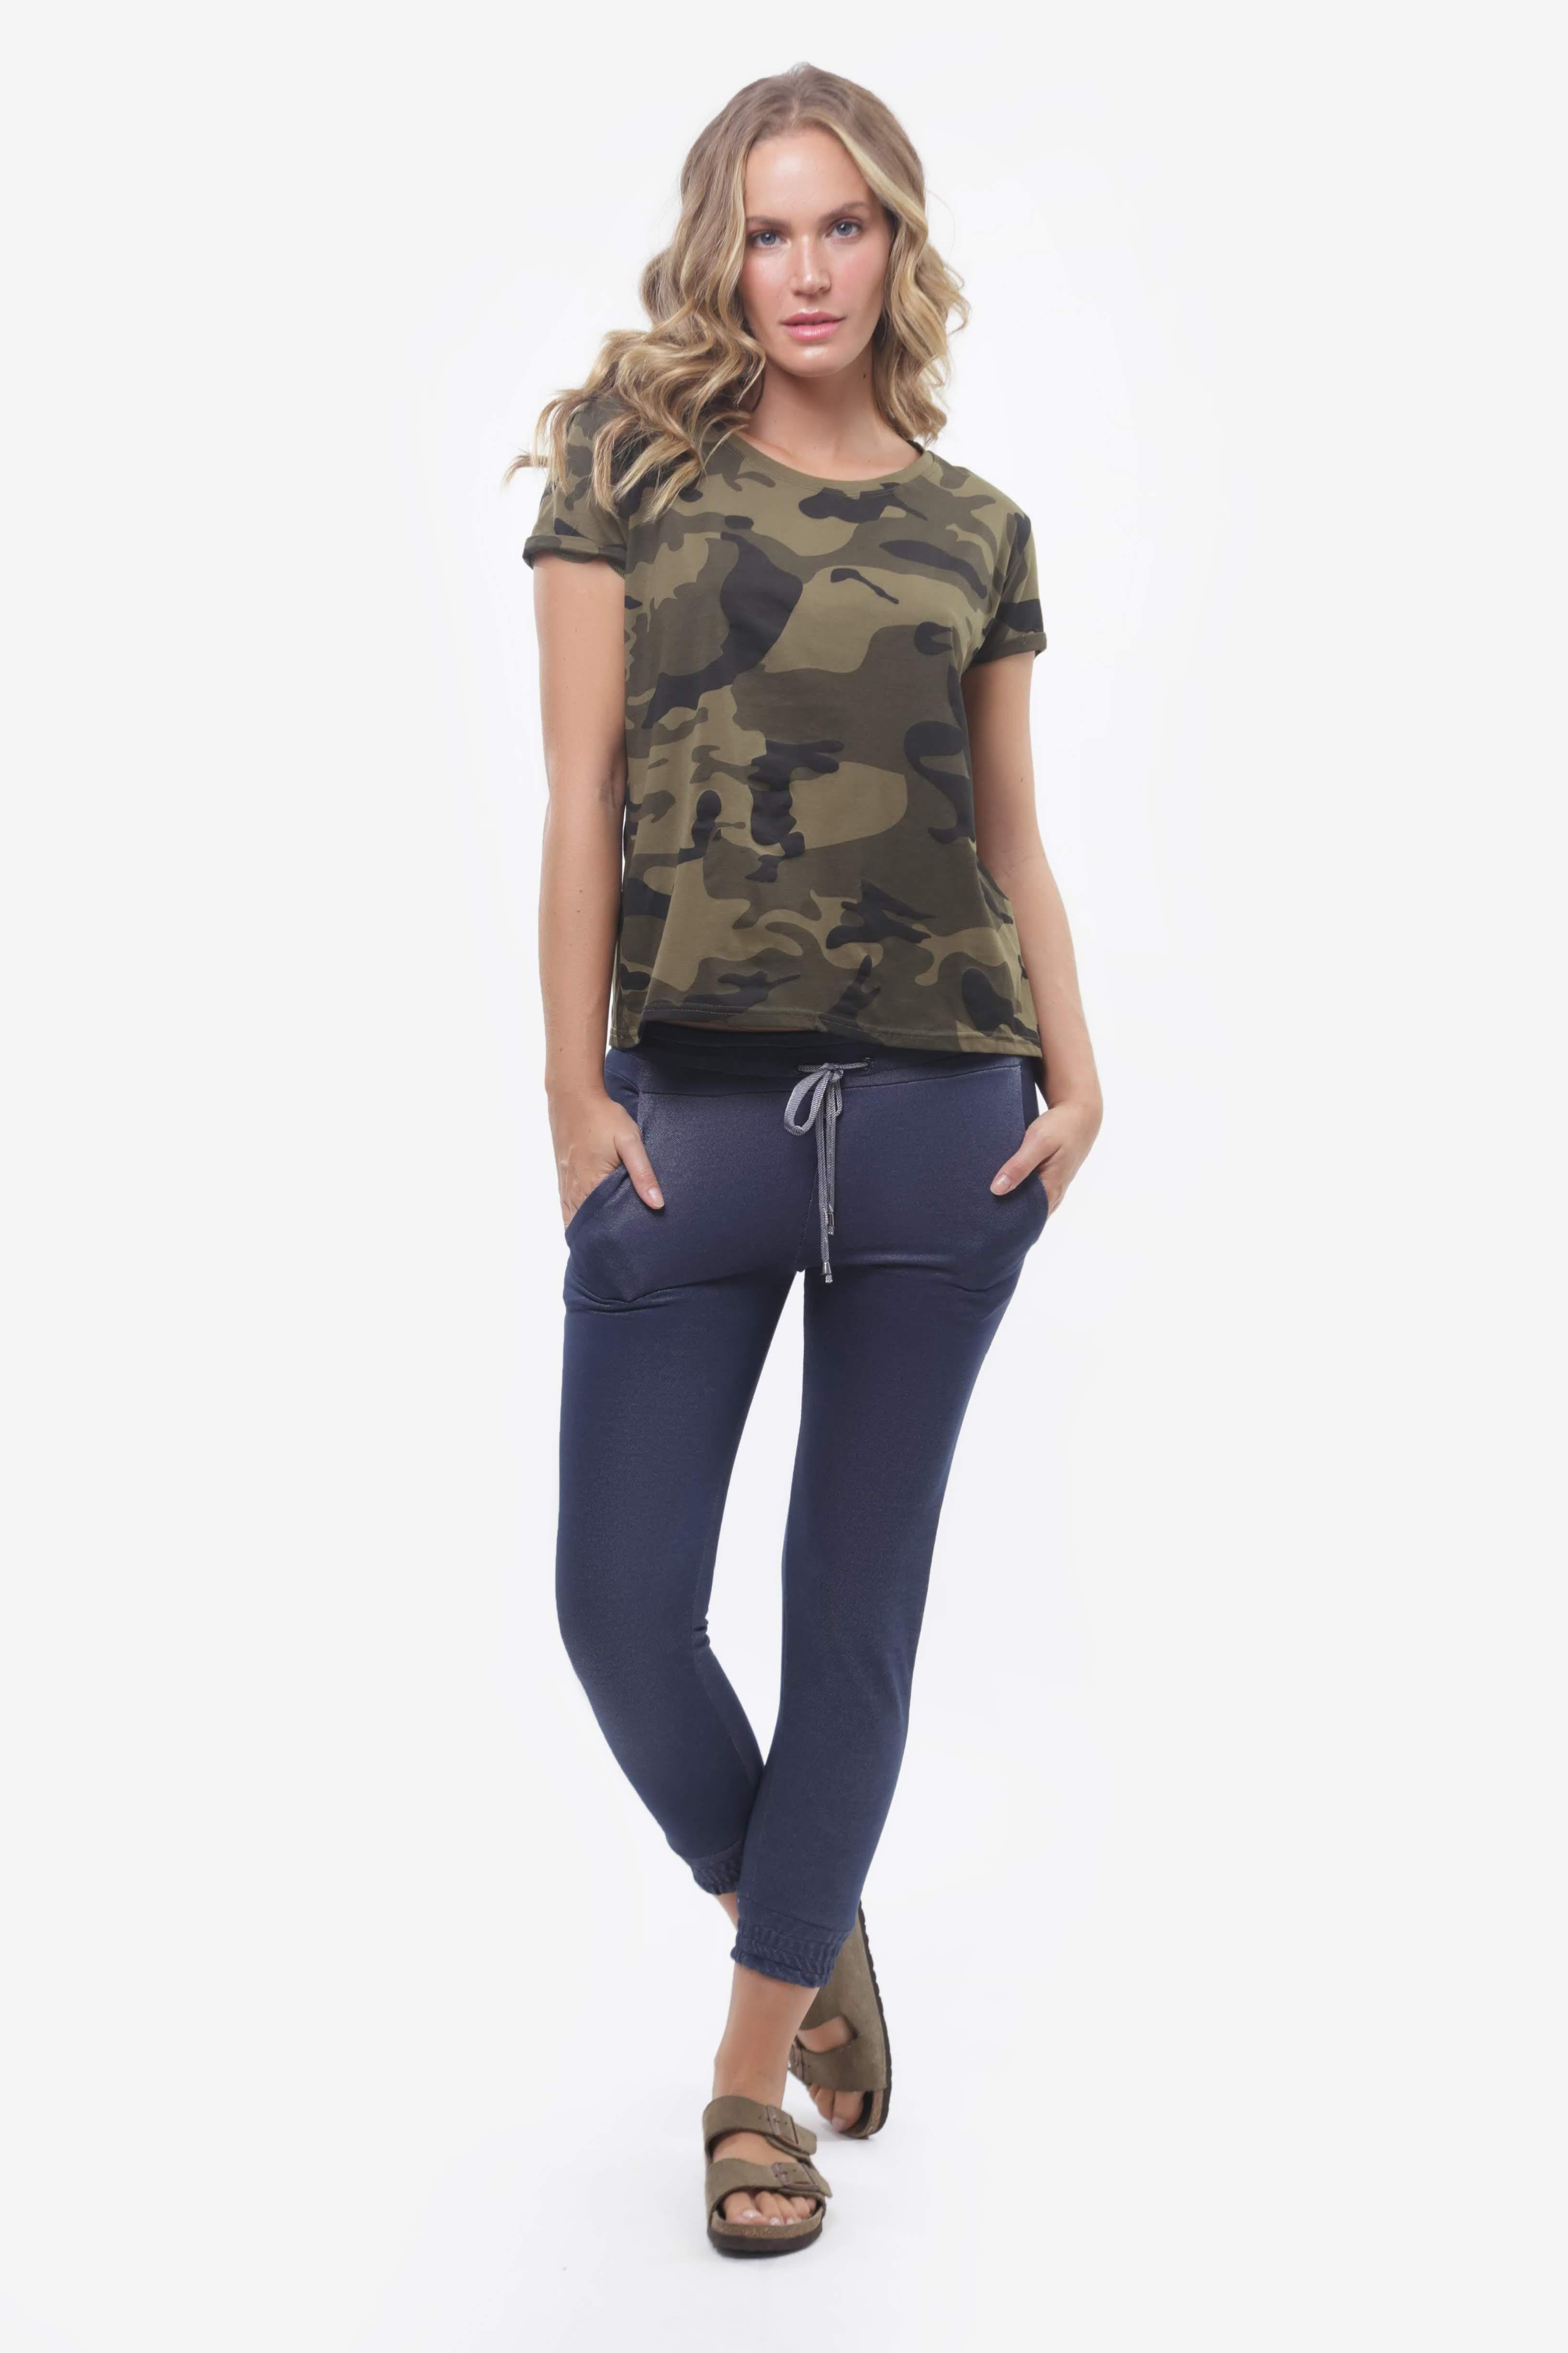 Tshirt Camuflada e Jogger Jeans